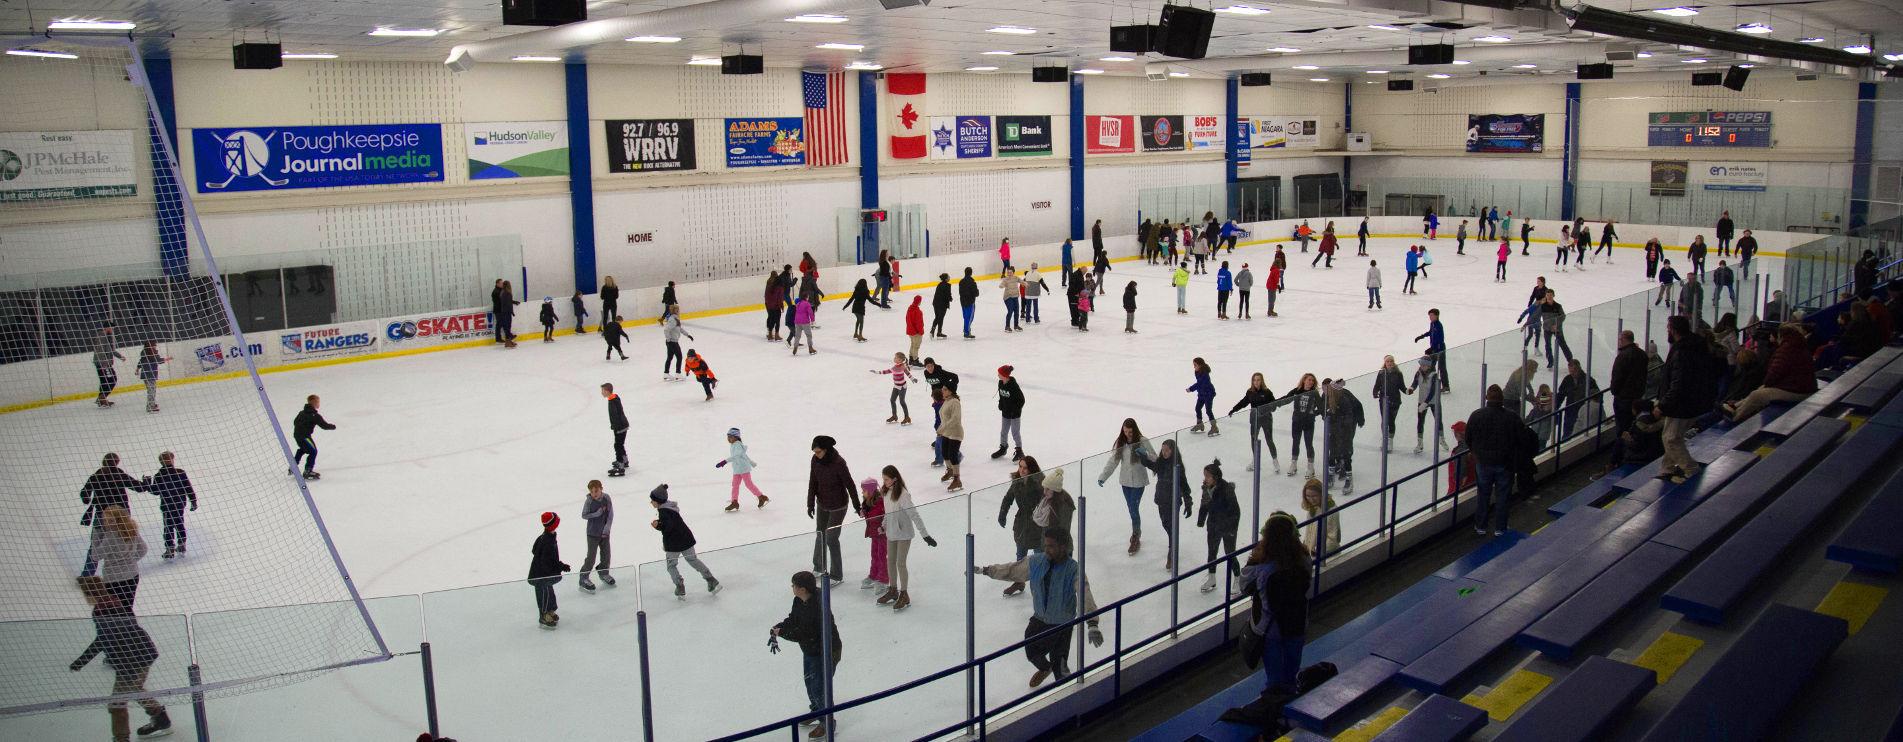 MHCC McCann Ice Arena